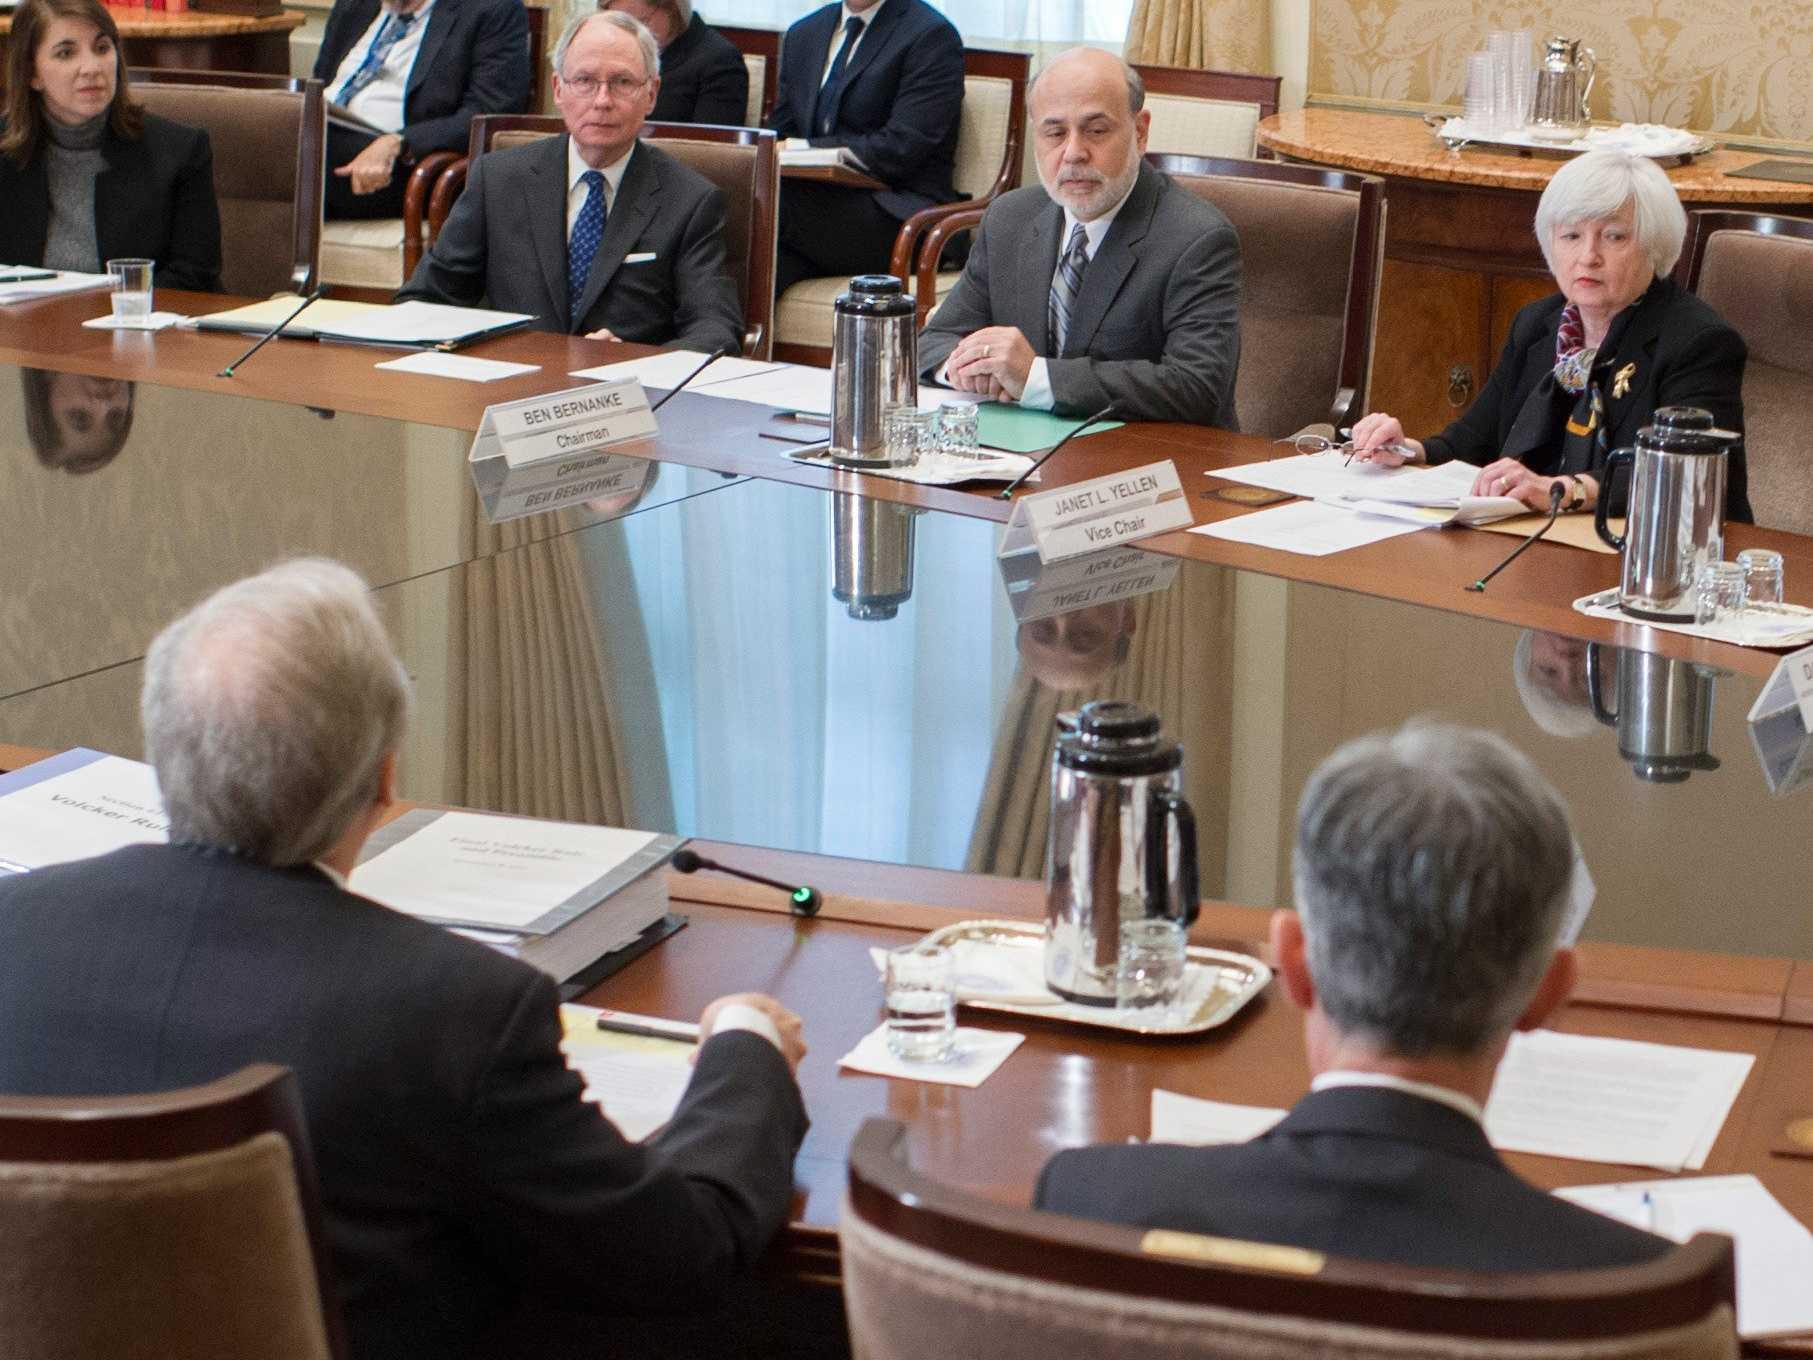 16-17 September 2014 FOMC Meeting minutes - Econ Alerts